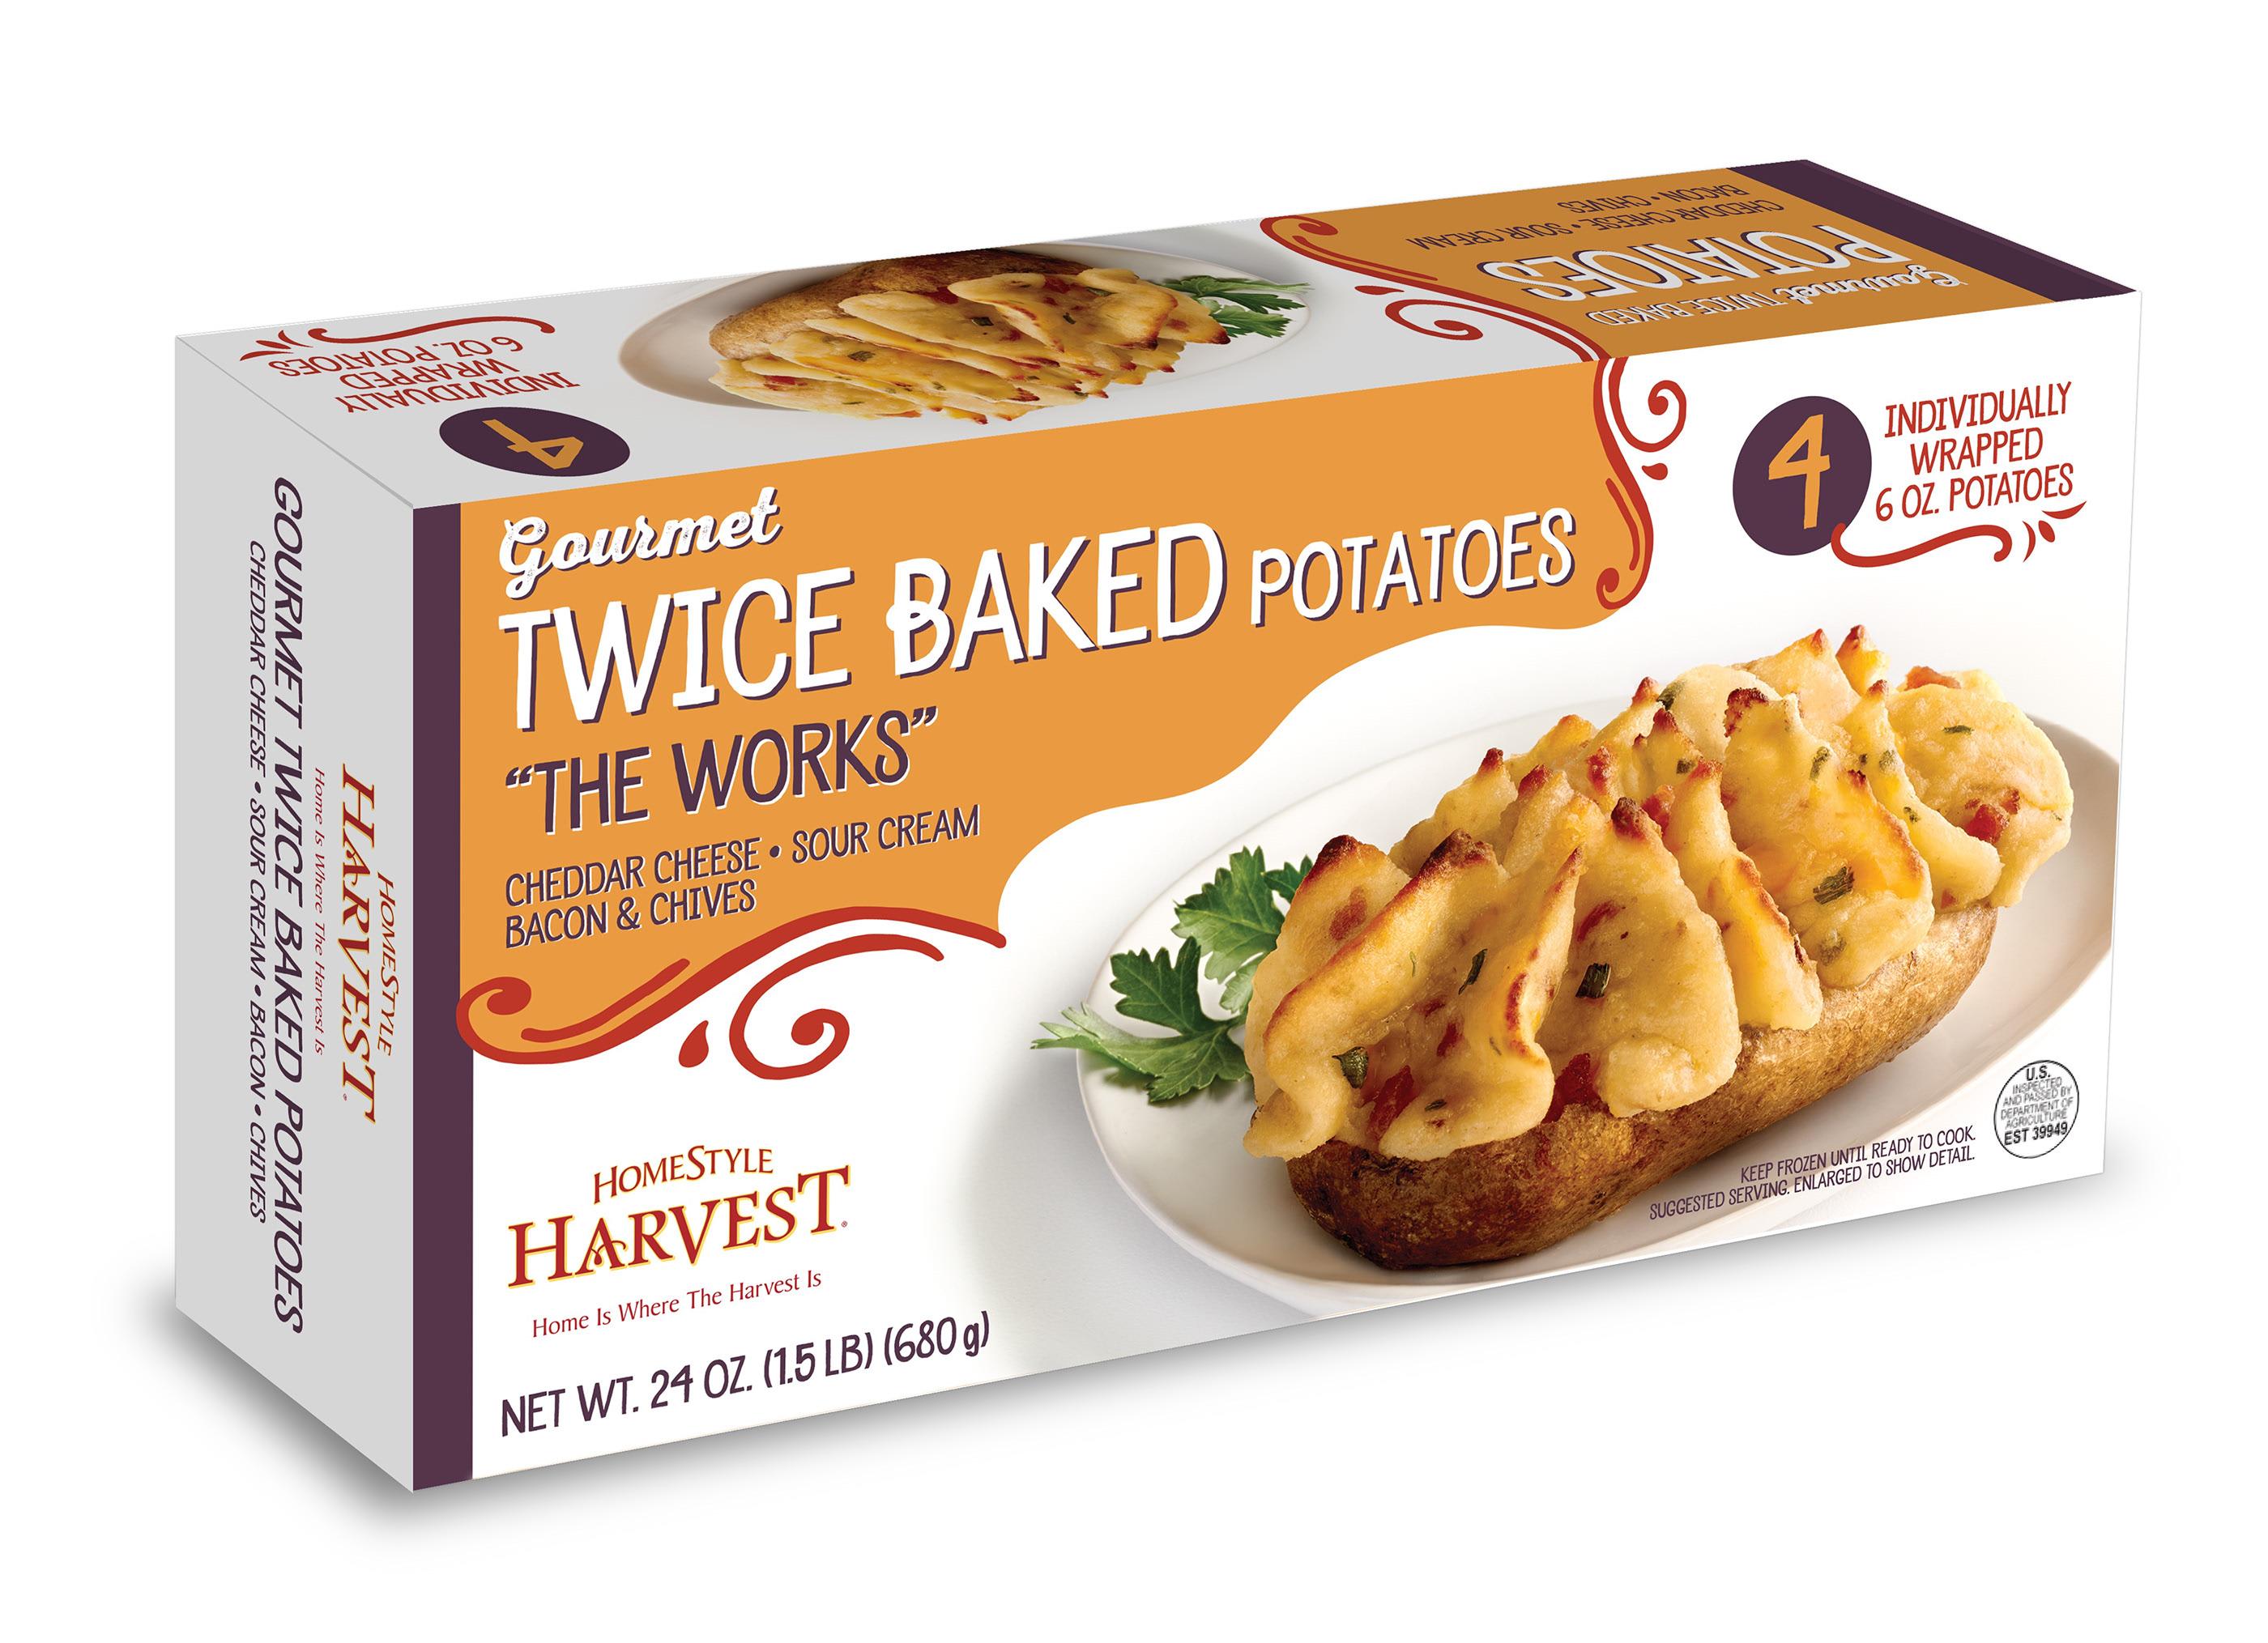 Homestyle Harvest Twice Baked Potatoes On Behance